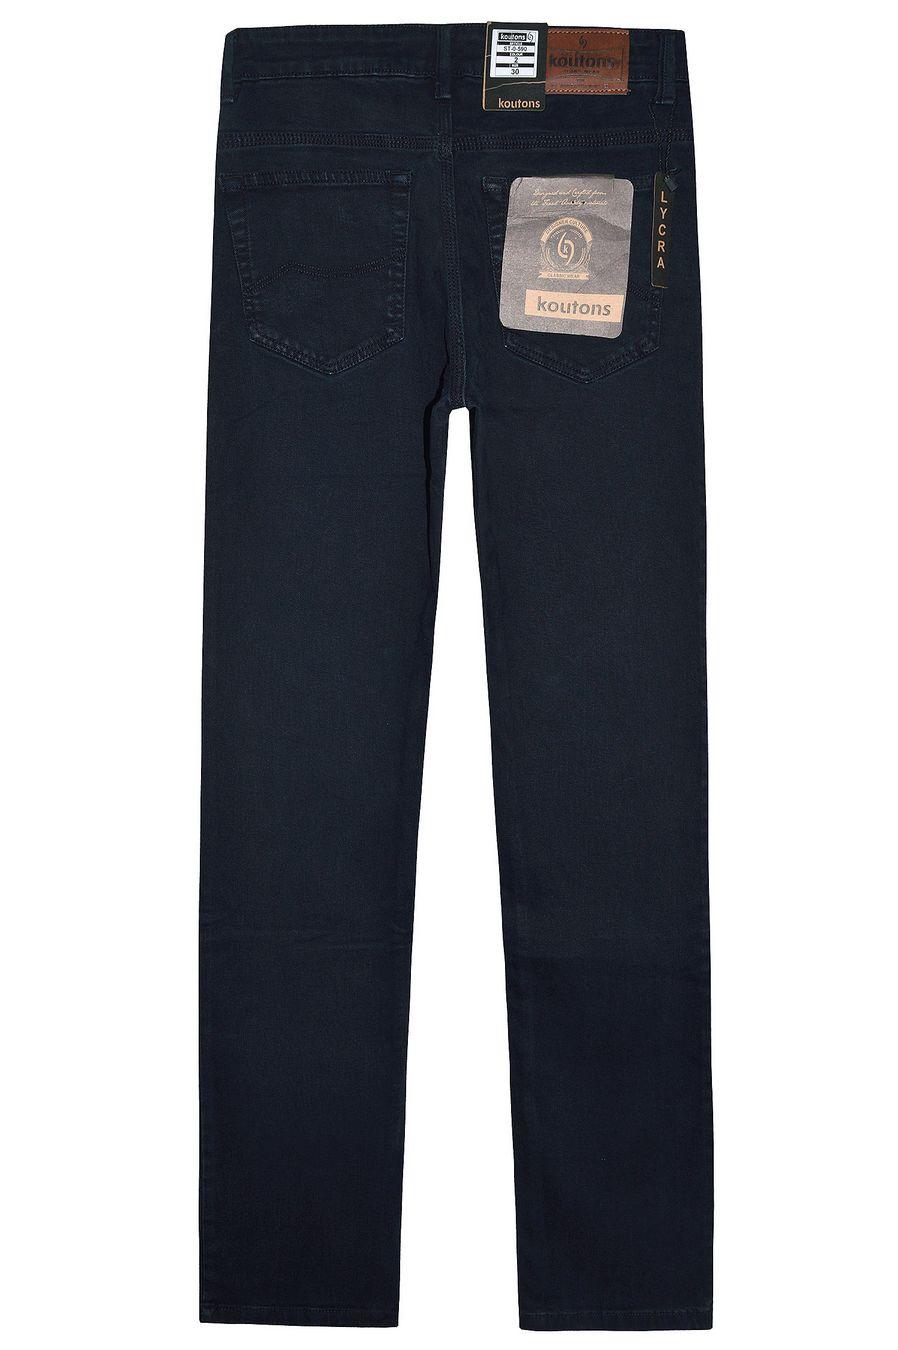 Джинсы мужские Koutons ST-0-590-2 Stretch Blue-Blue - фото 6